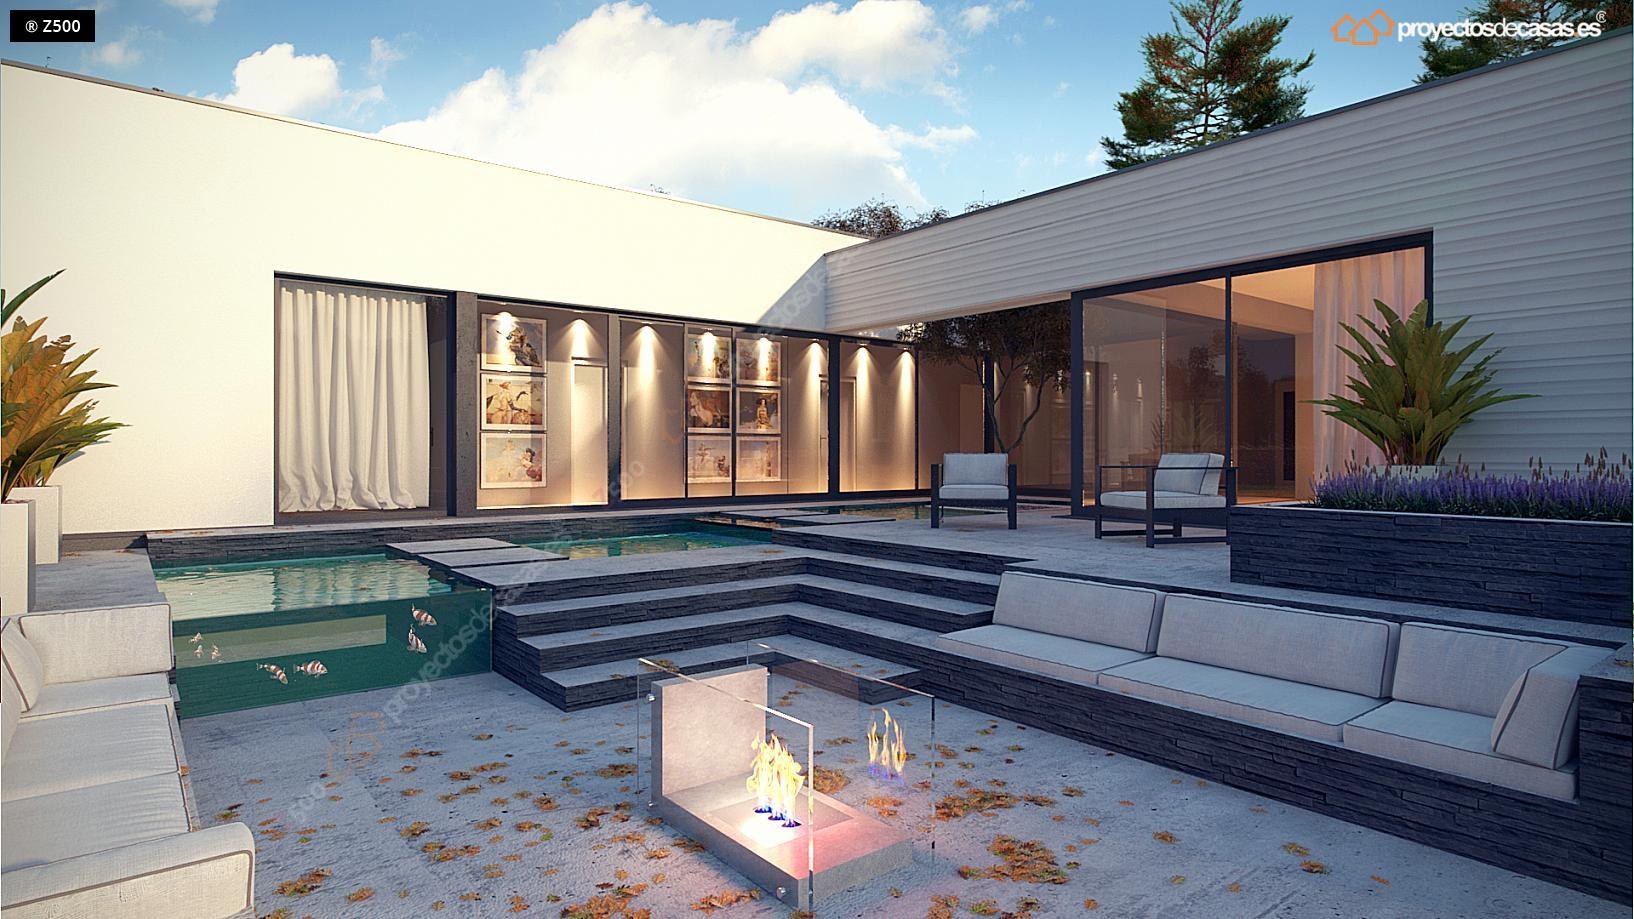 Proyectos de casas casa moderna de 1 planta con piscina - Fotos de casas en forma de l ...